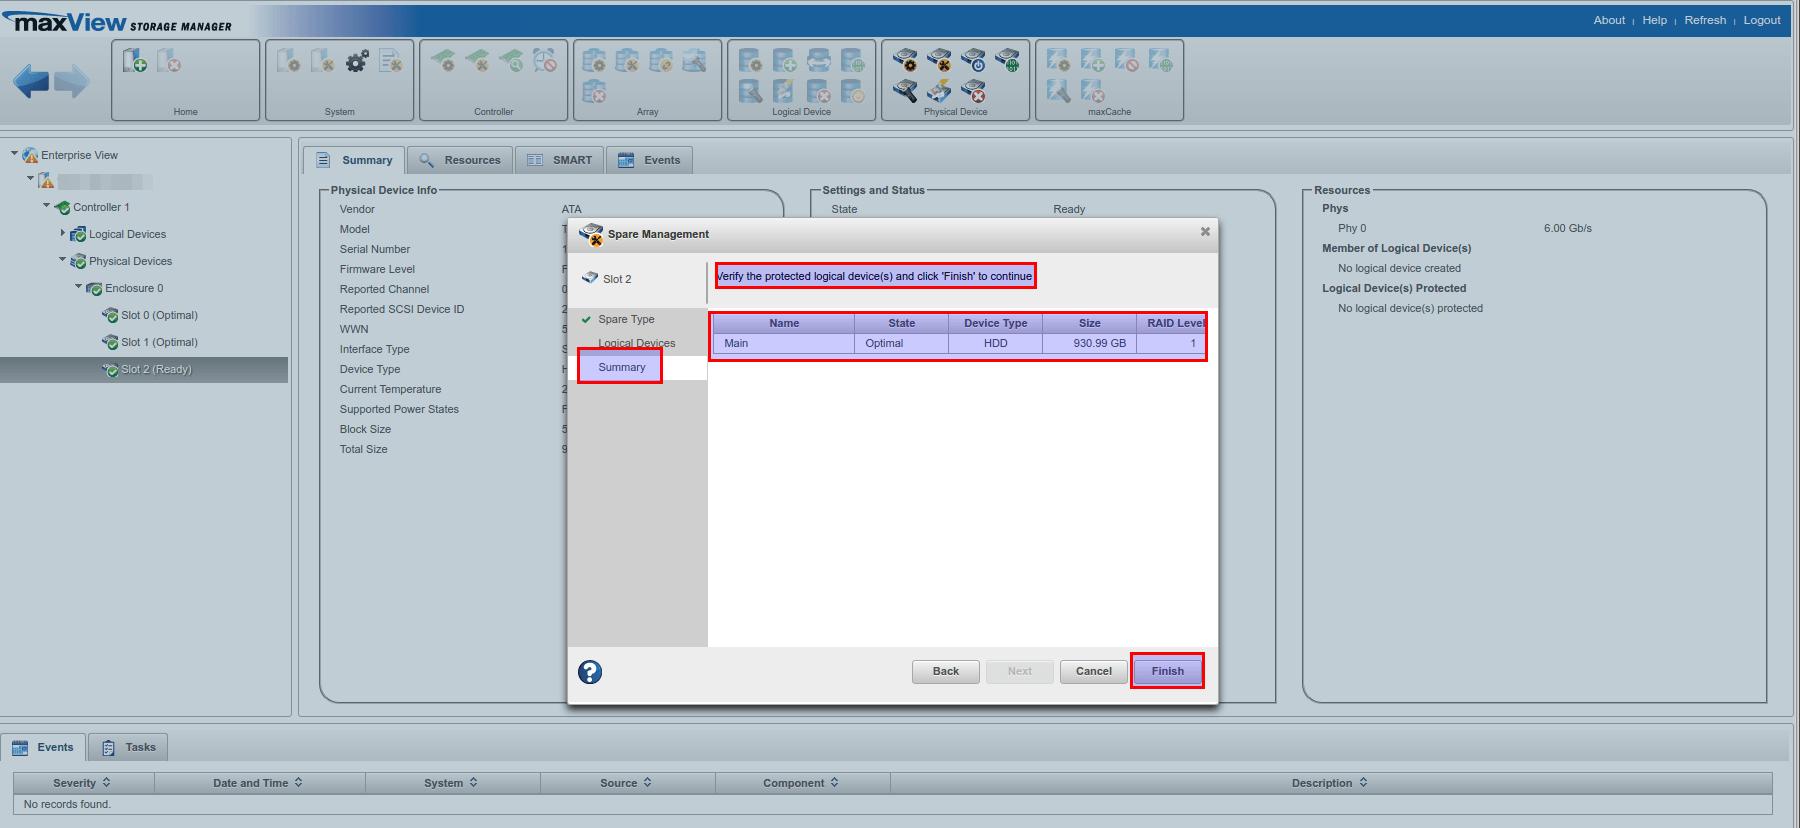 maxview storage manager пароль по умолчанию